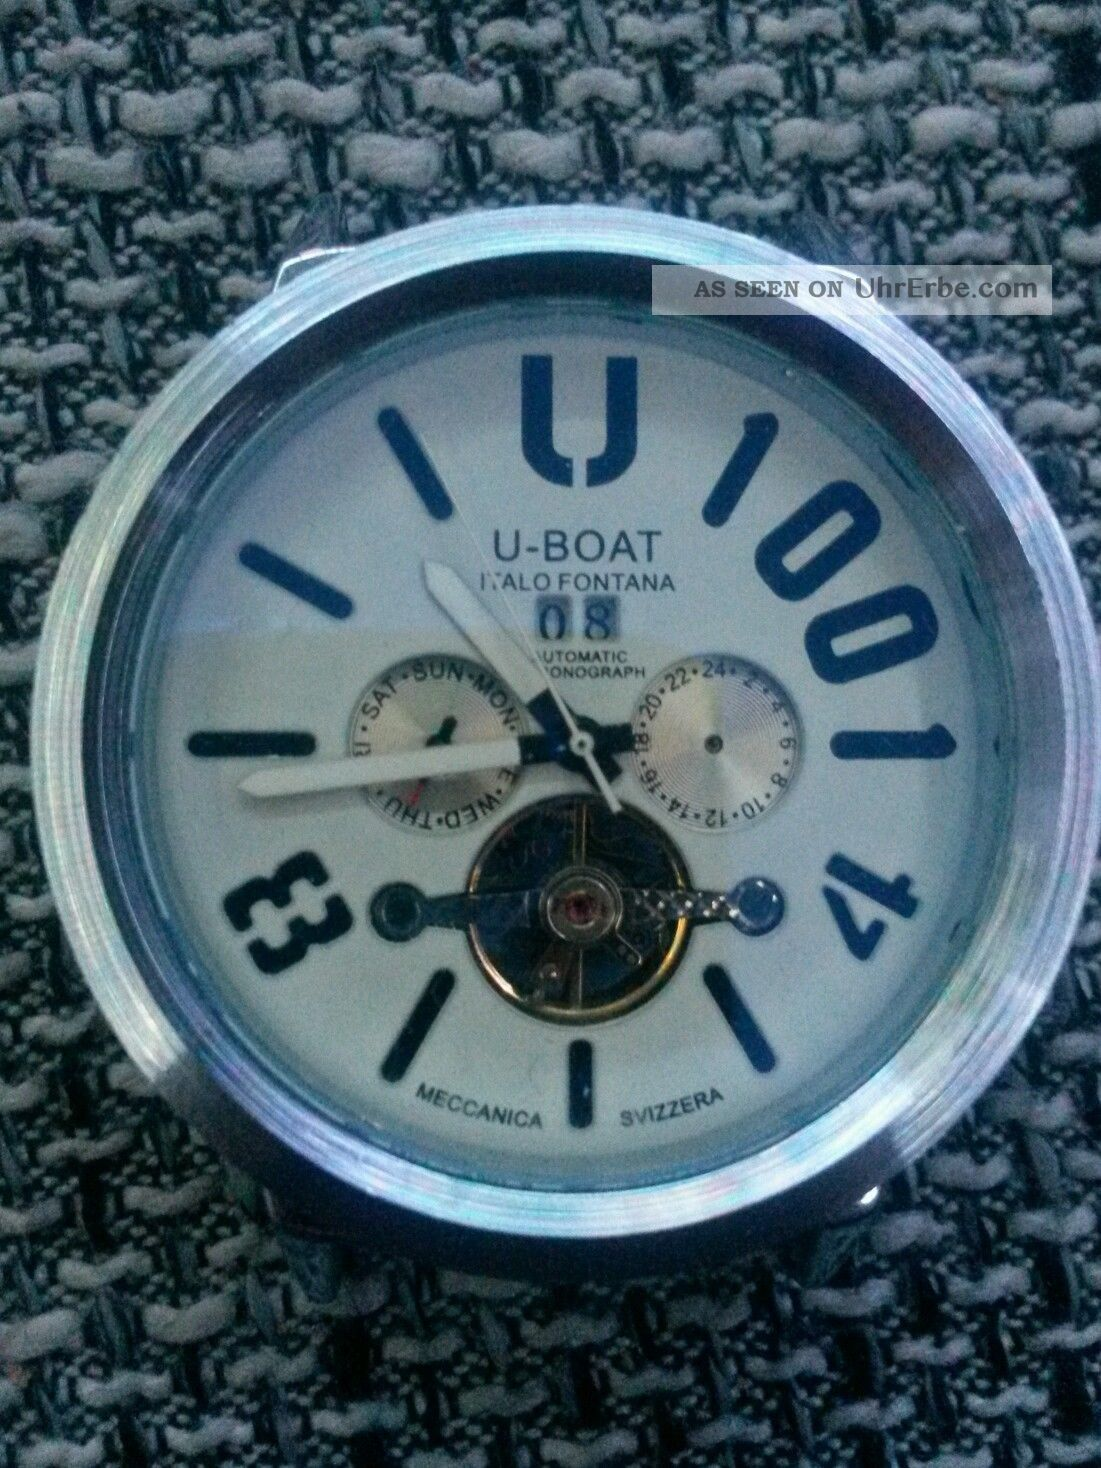 Uhr U - Boat 1001 - Spezial Edition - Edizione Speciale - U/28 - 013 Von 999 Armbanduhren Bild